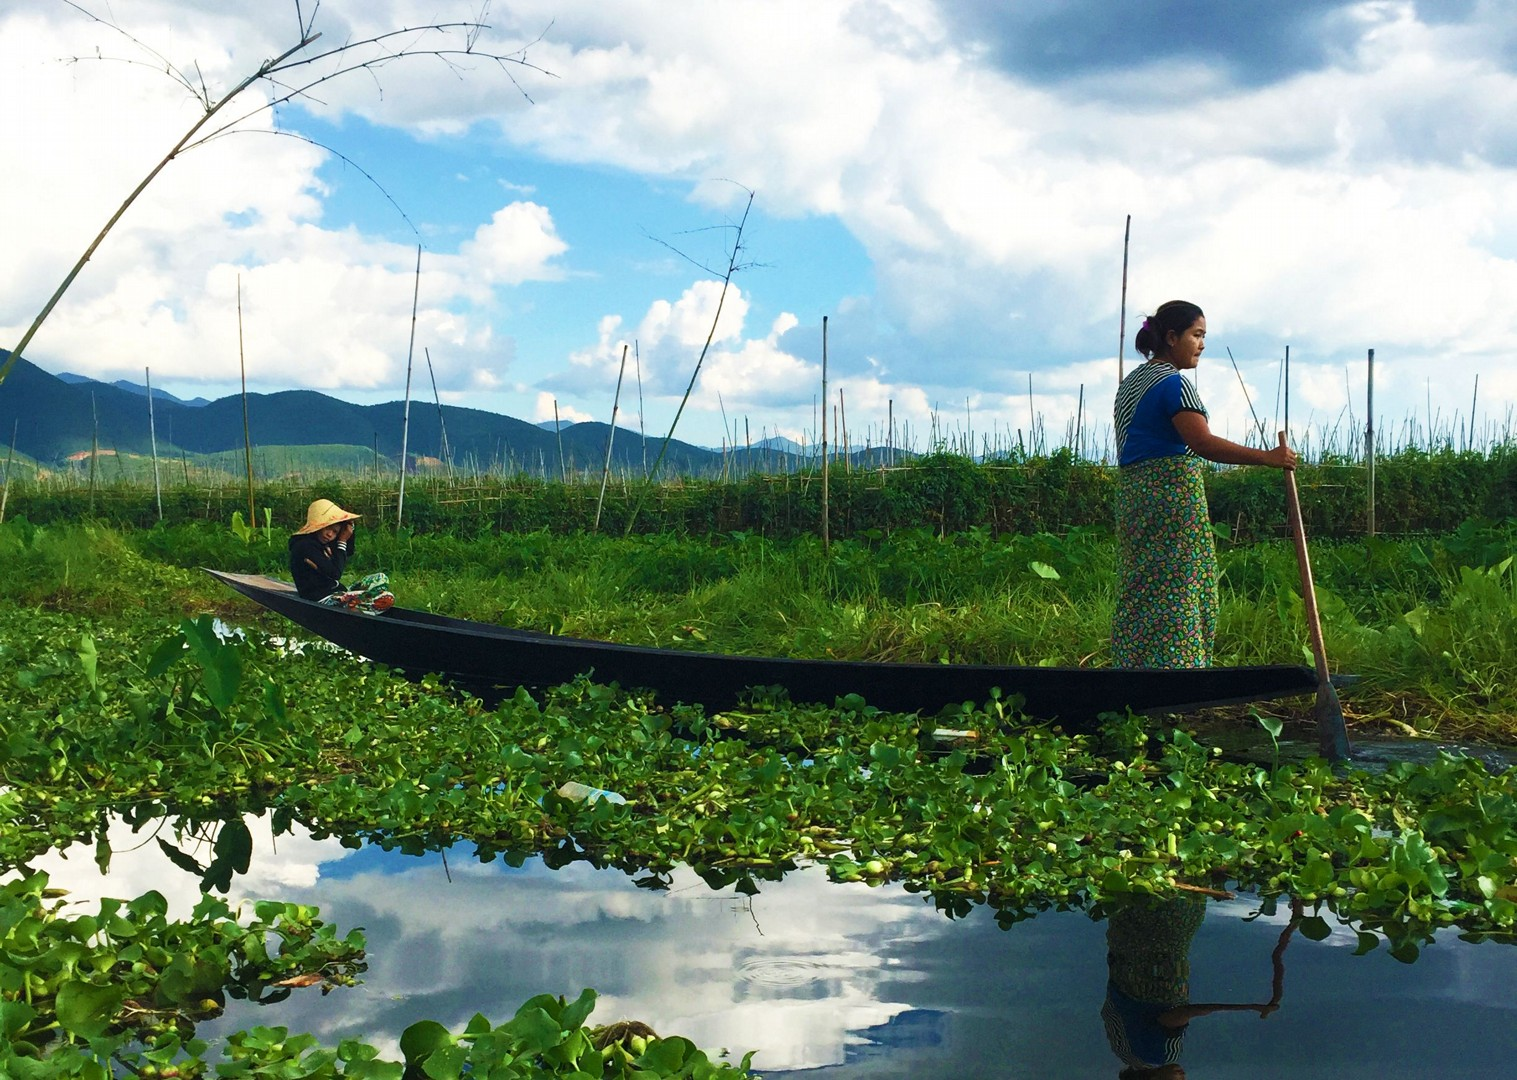 explore-idyllic-inle-lake-by-boat-burma-cycling-trip.jpg - Myanmar (Burma) - Bagan and Beyond - Cycling Adventures